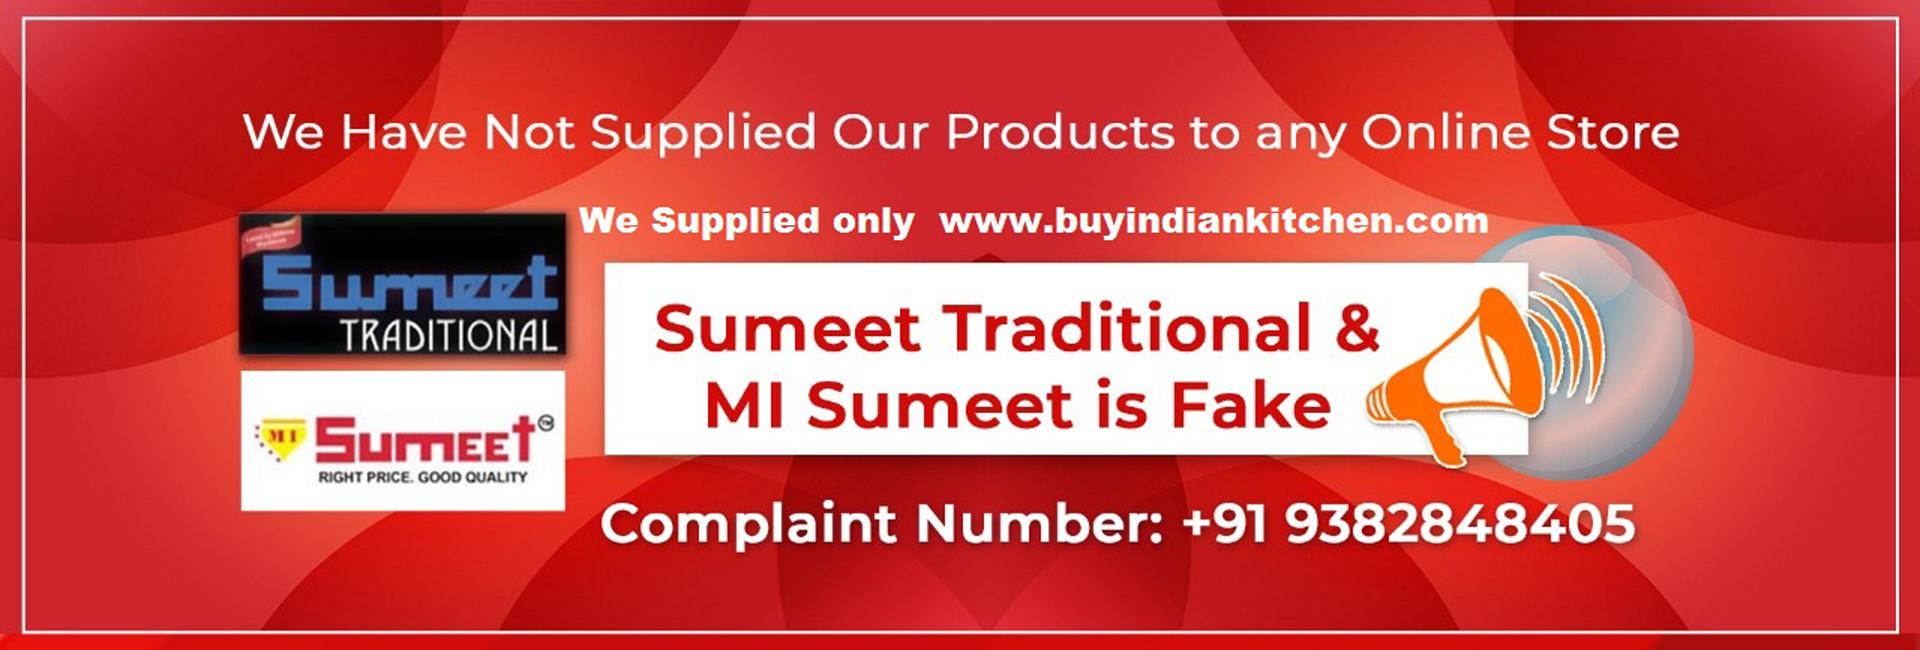 sumeetand-buyindian